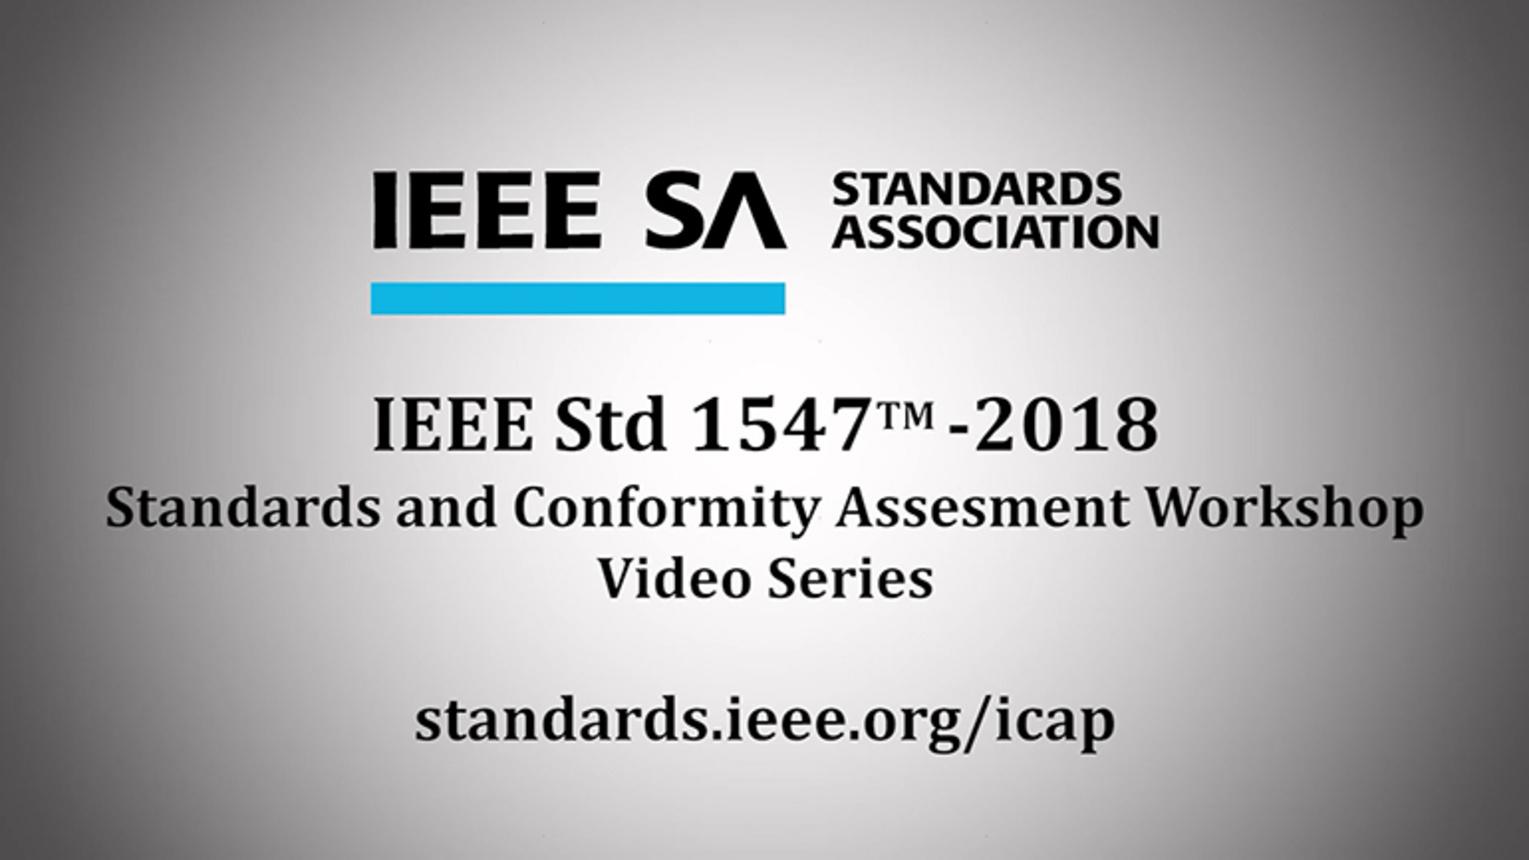 IEEE Std 1547